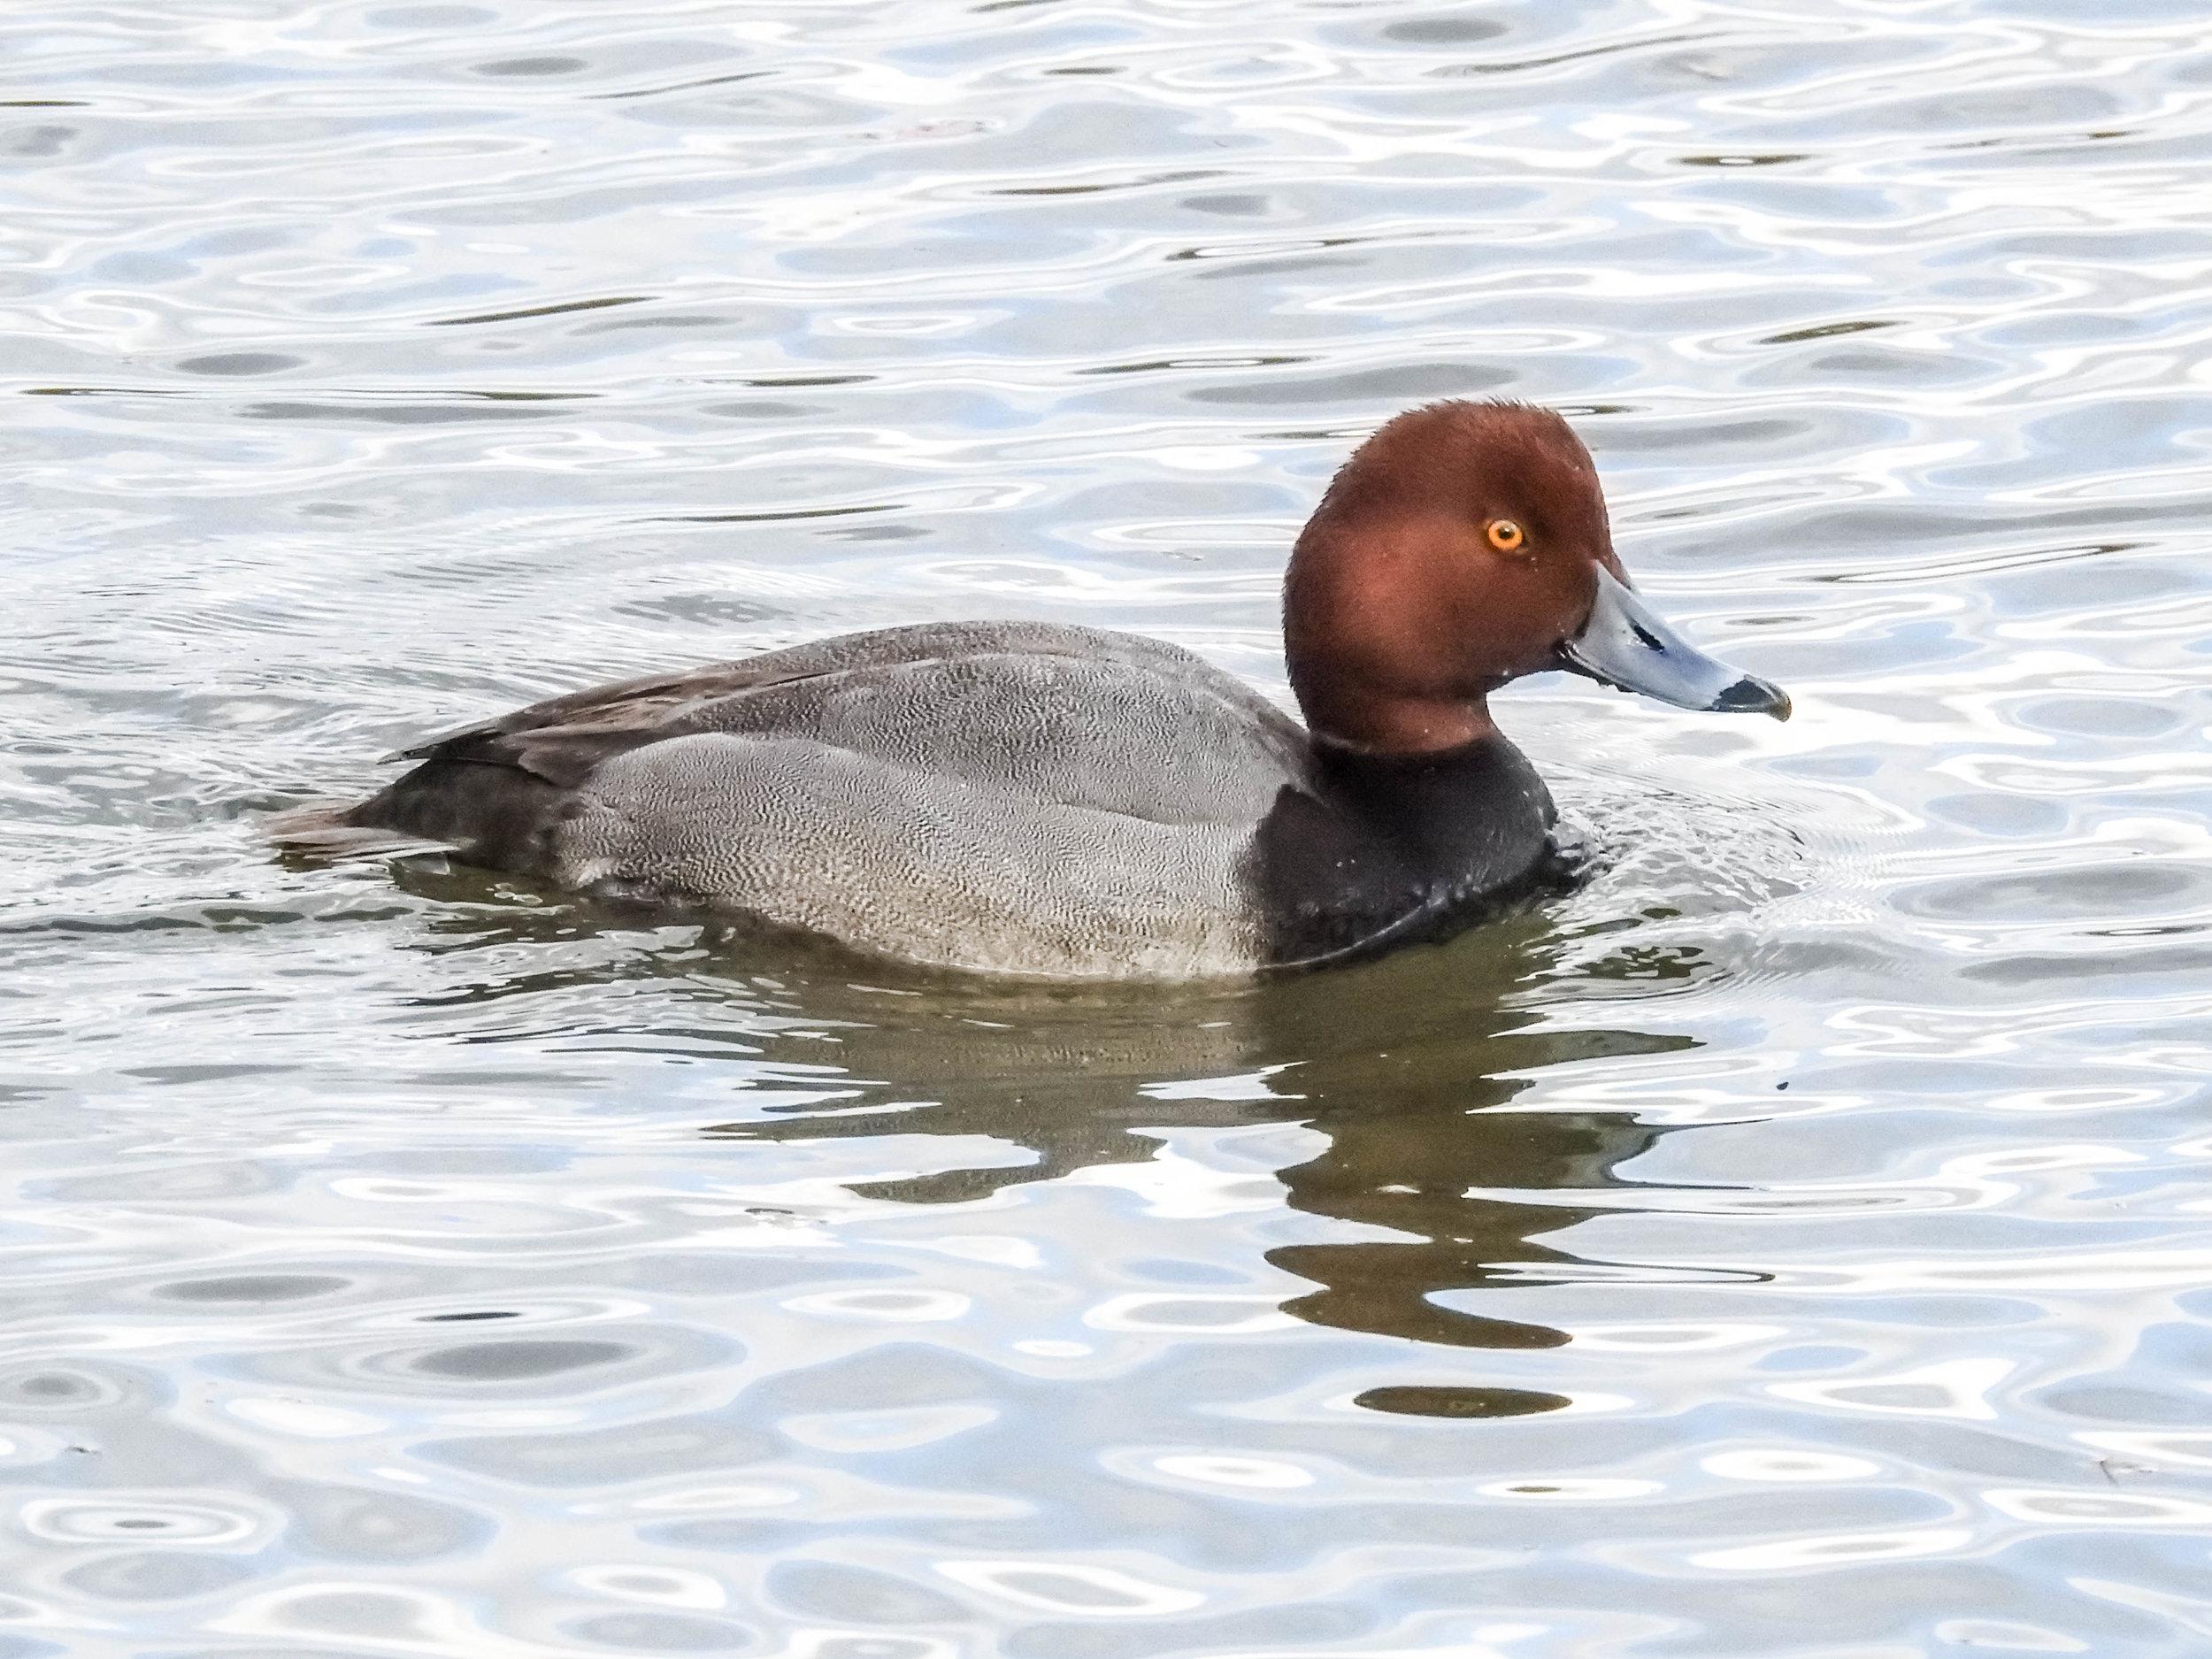 Redhead, male